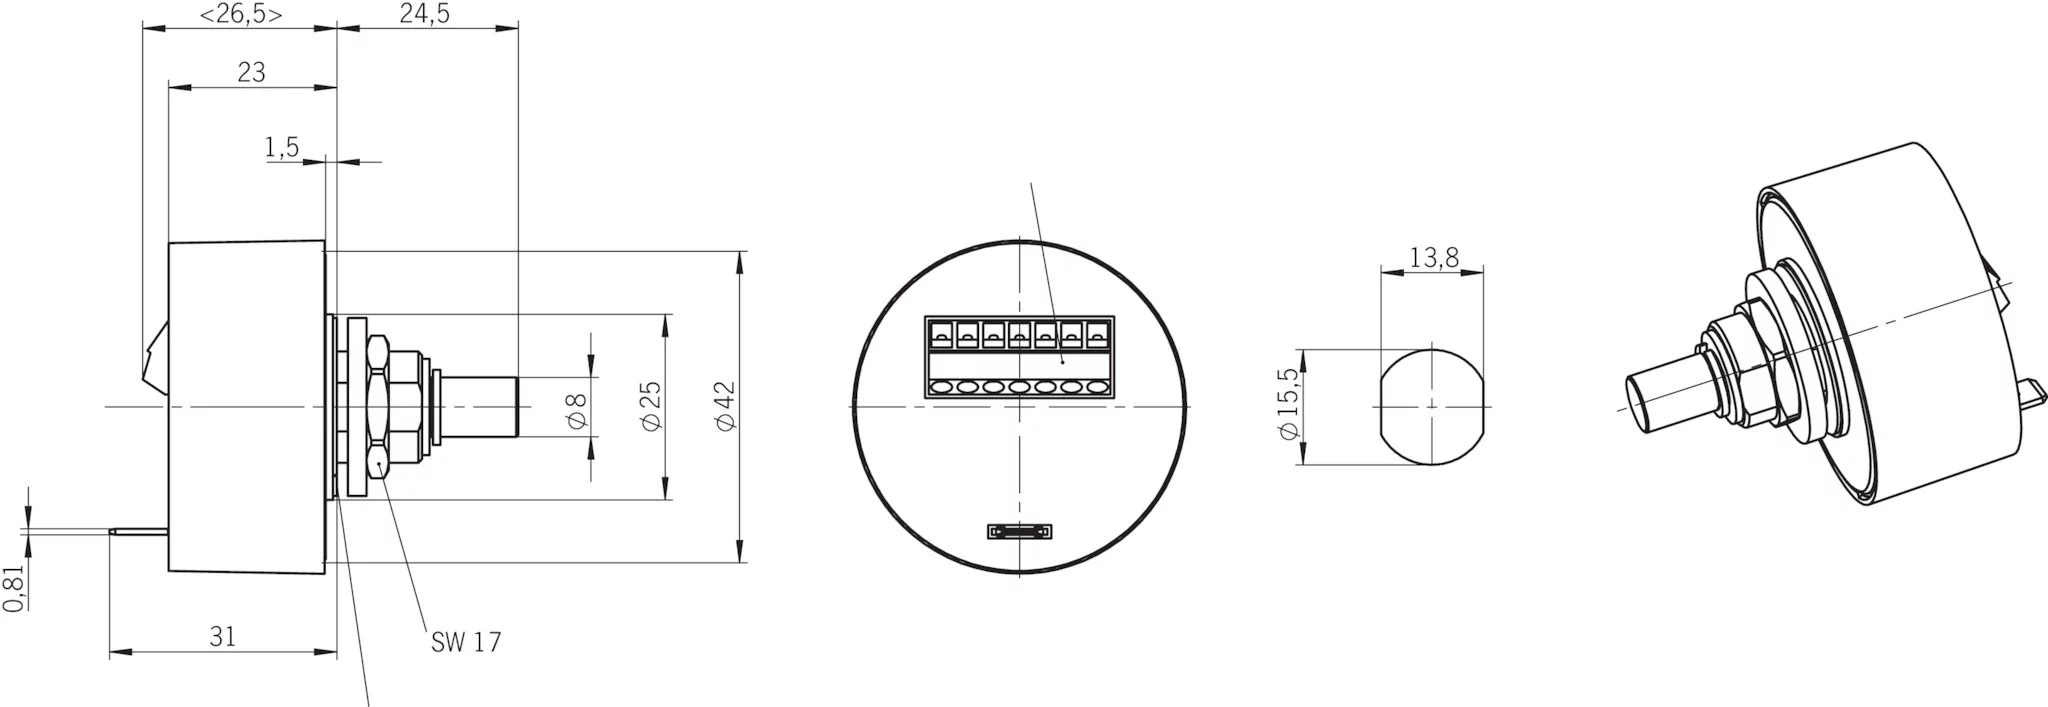 HKB100S7A05K Handwheel HKB with momentary pushbutton